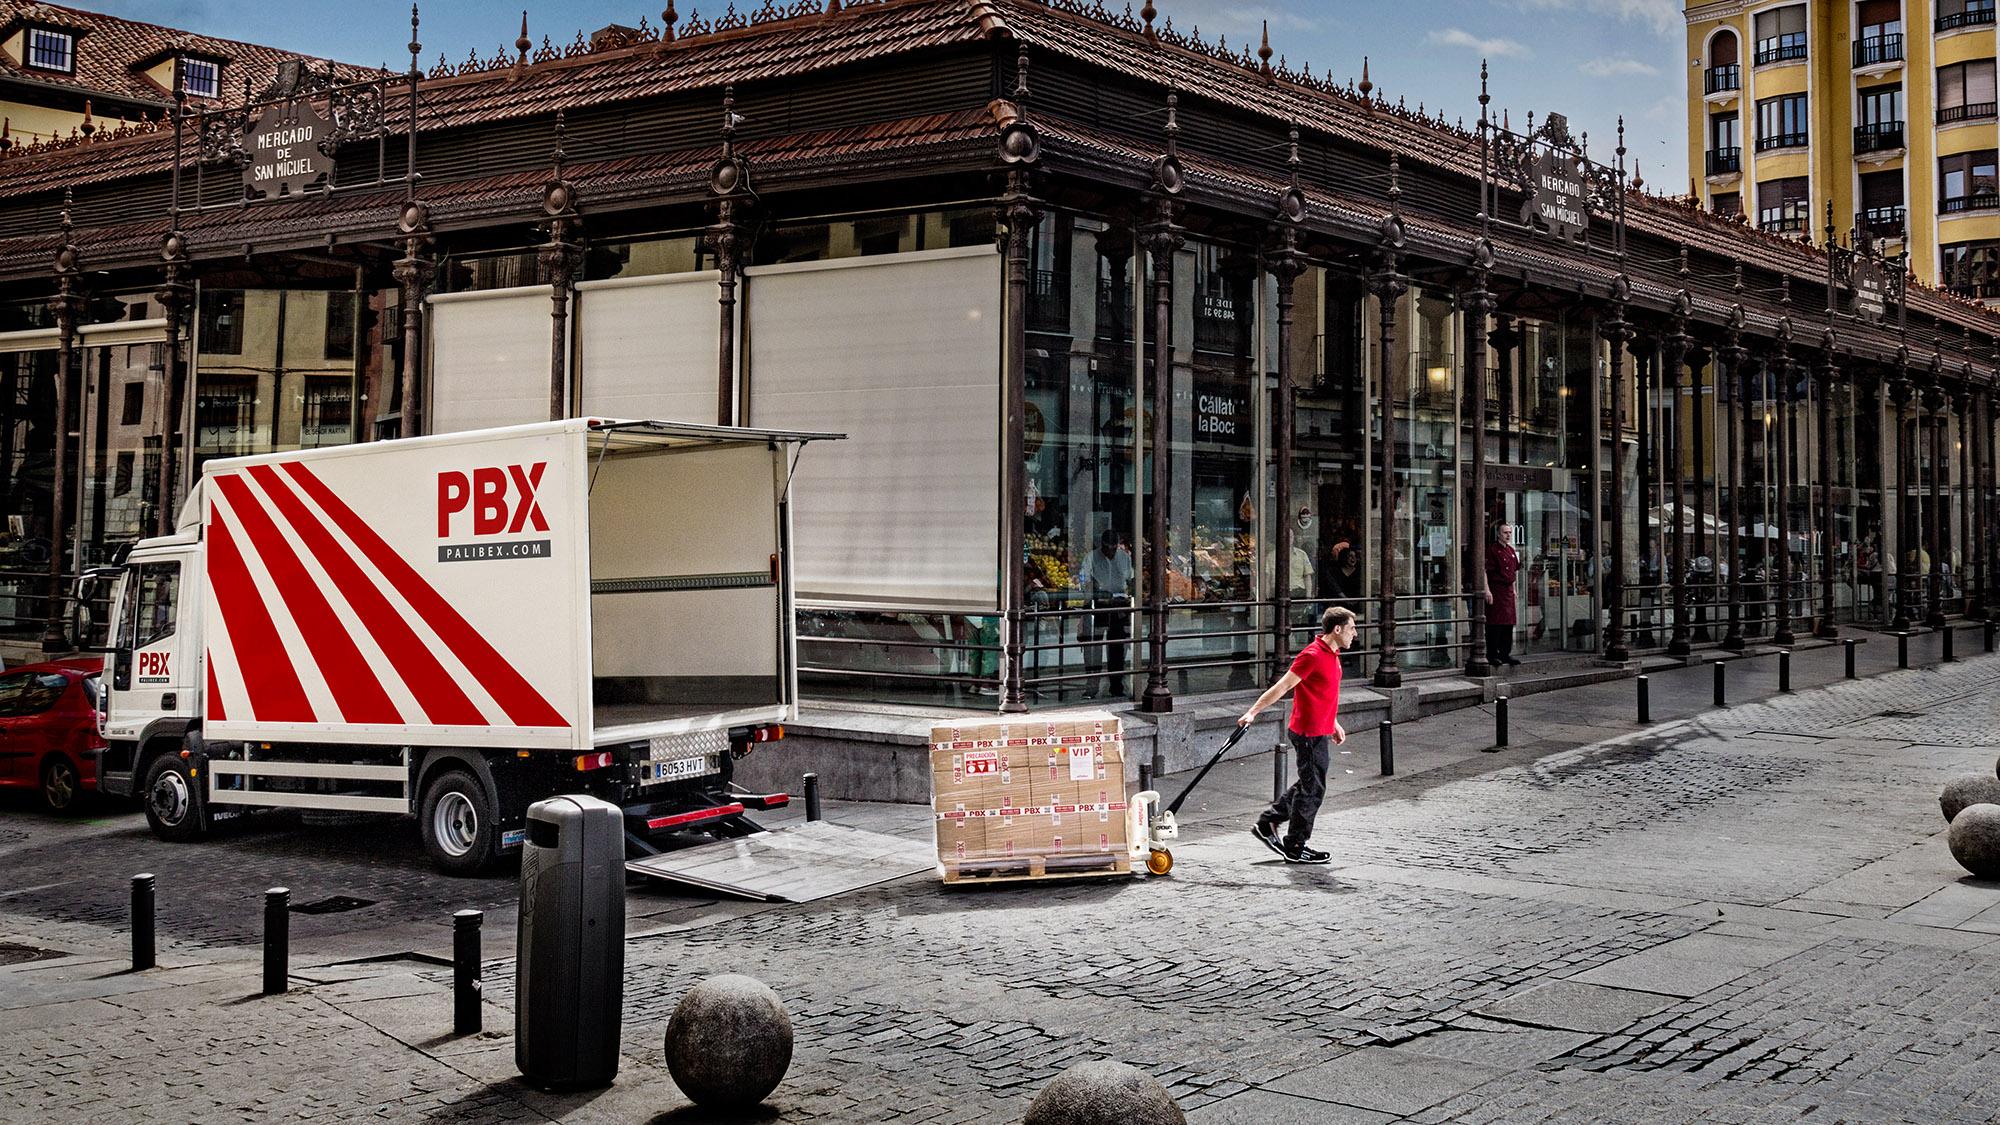 Palibex -PBX -Transporte urgente mercancia paletizada - Beusual -ROTULACION FLOTA